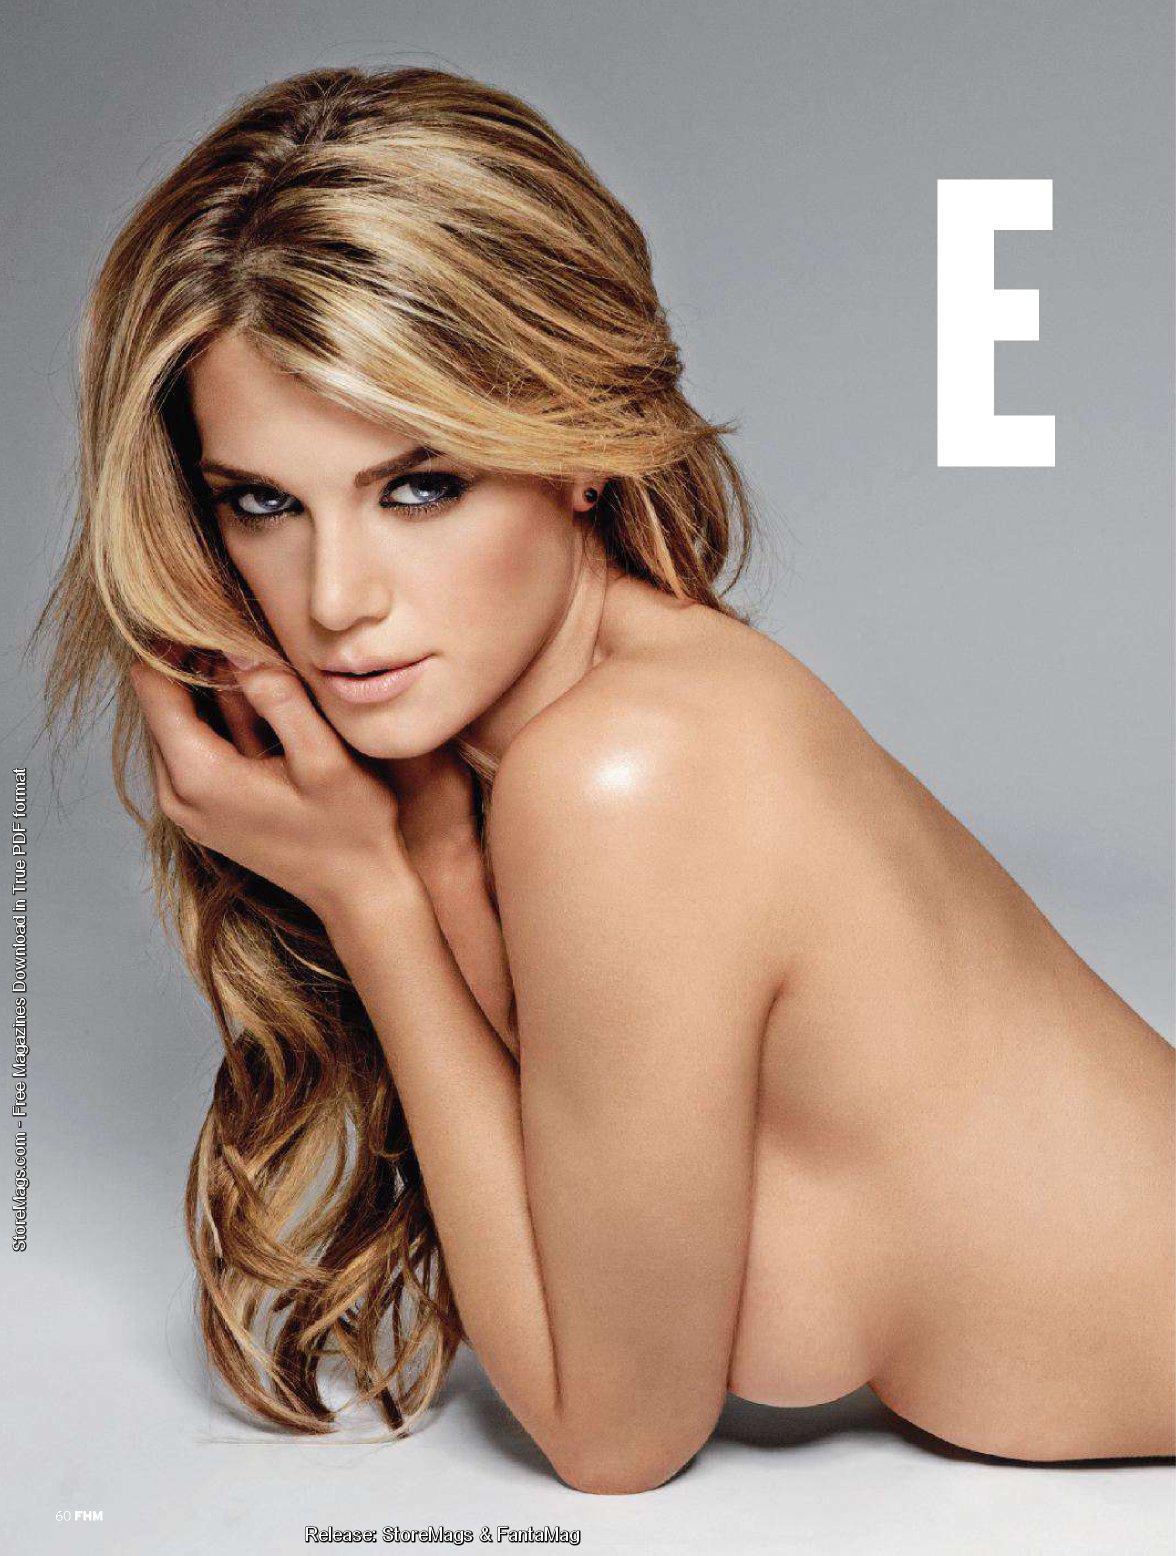 Elle Liberachi Insanely Hot - Sexy Naked Women